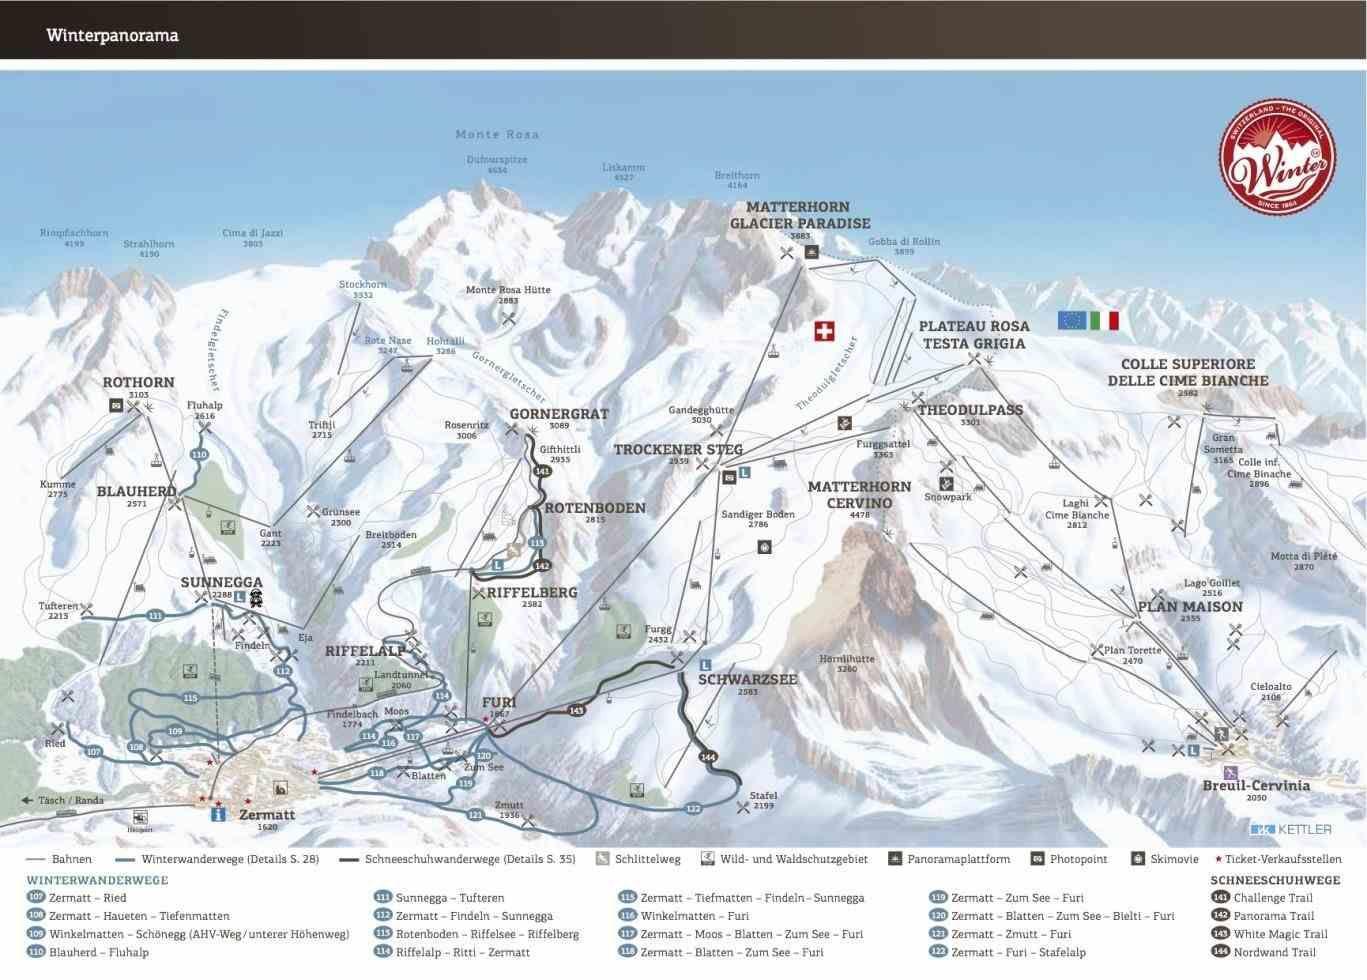 Pin by best picture on zermatt switzerland map Pinterest Zermatt